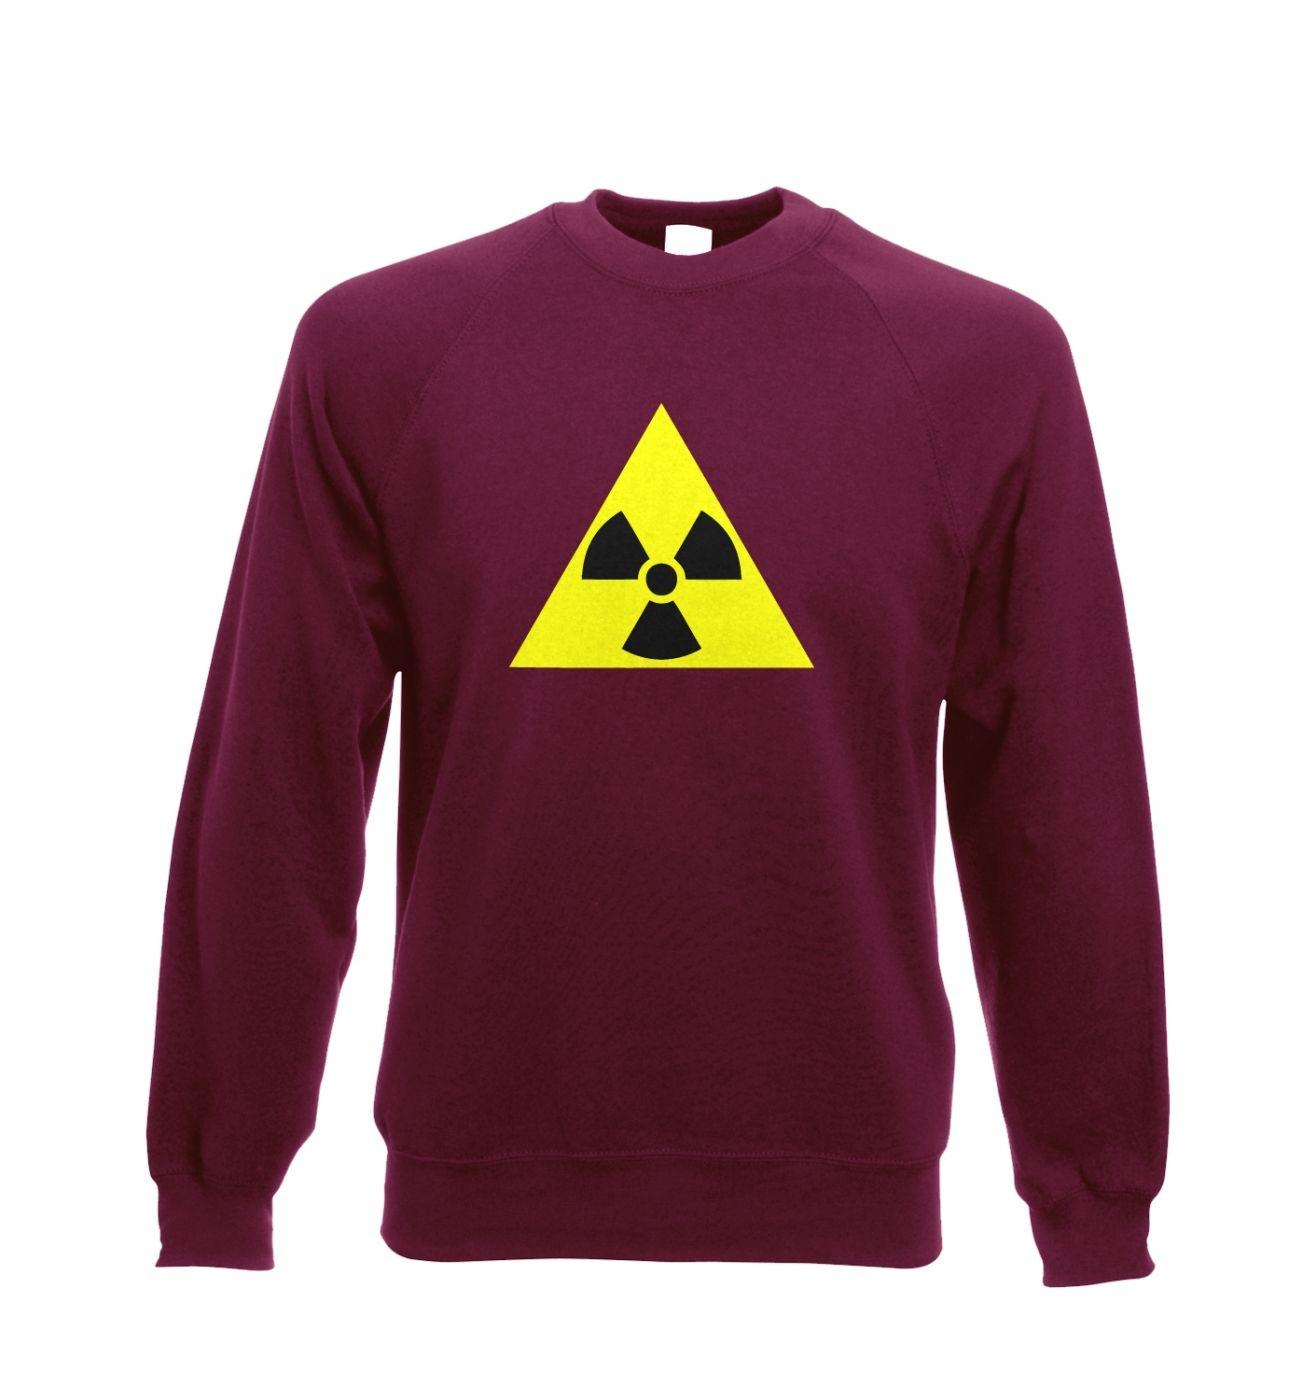 Radioactive Symbol Adult Crewneck Sweatshirt